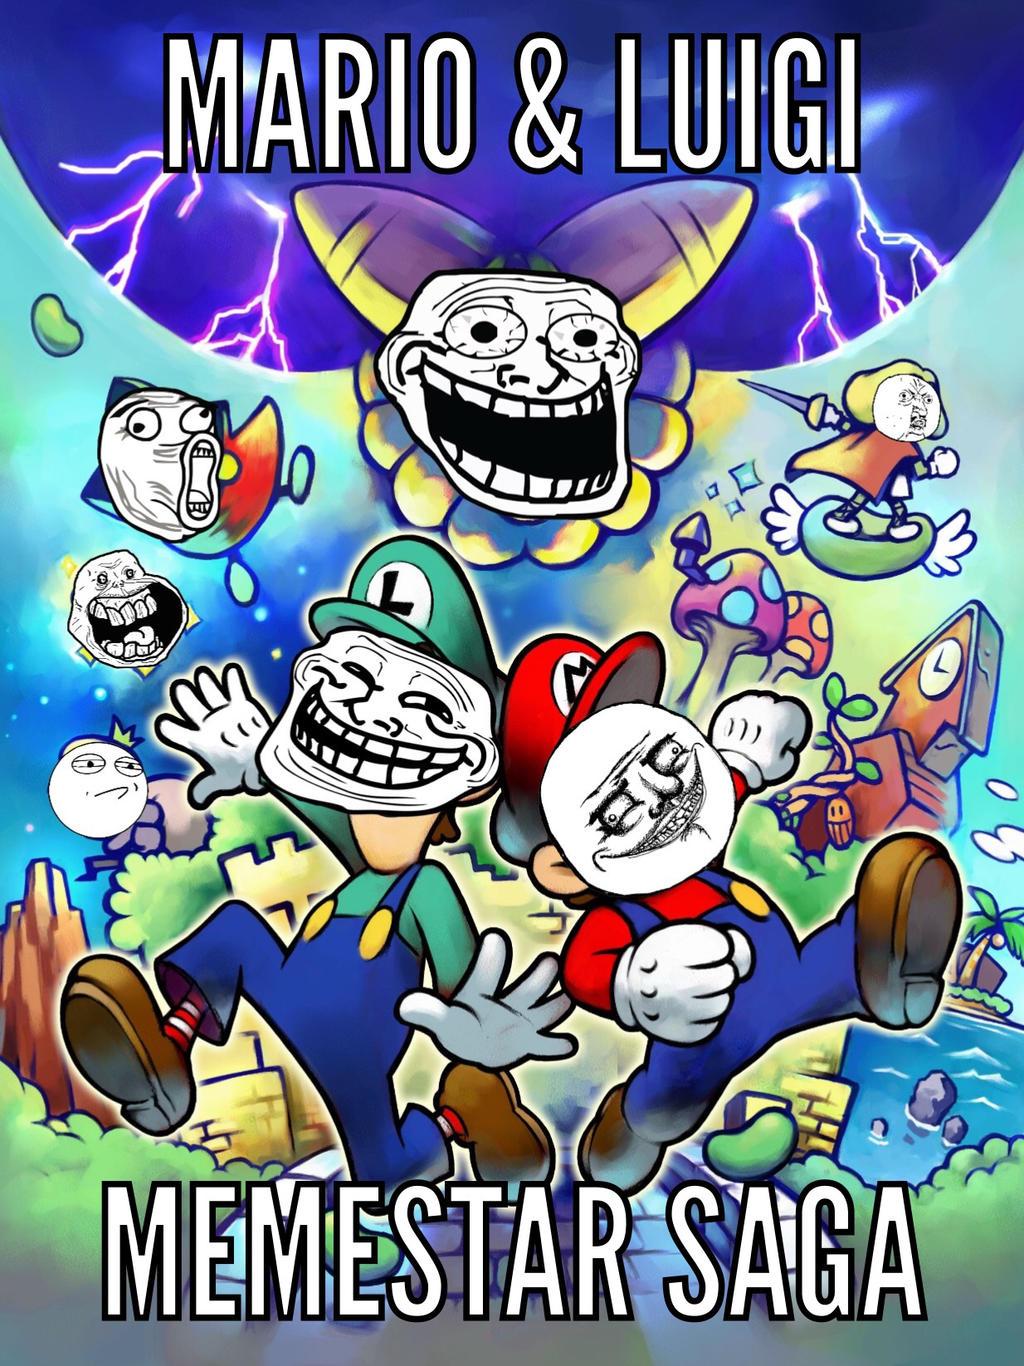 Mario And Luigi Memestar Saga My Meme By Chase Da Umbreon On